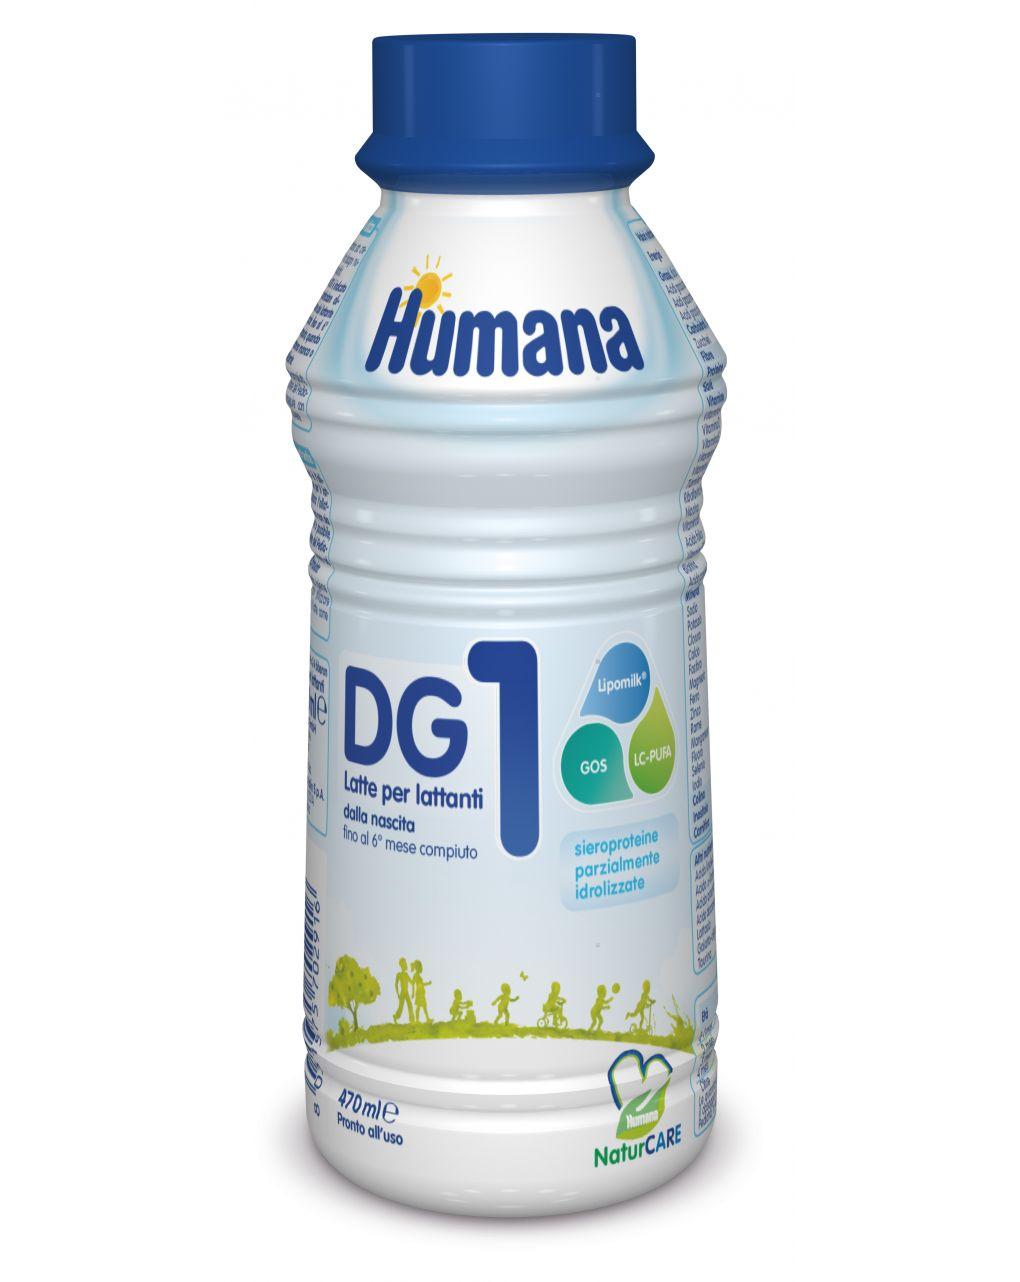 Humana - latte humana dg 1 liquido 470ml - Humana